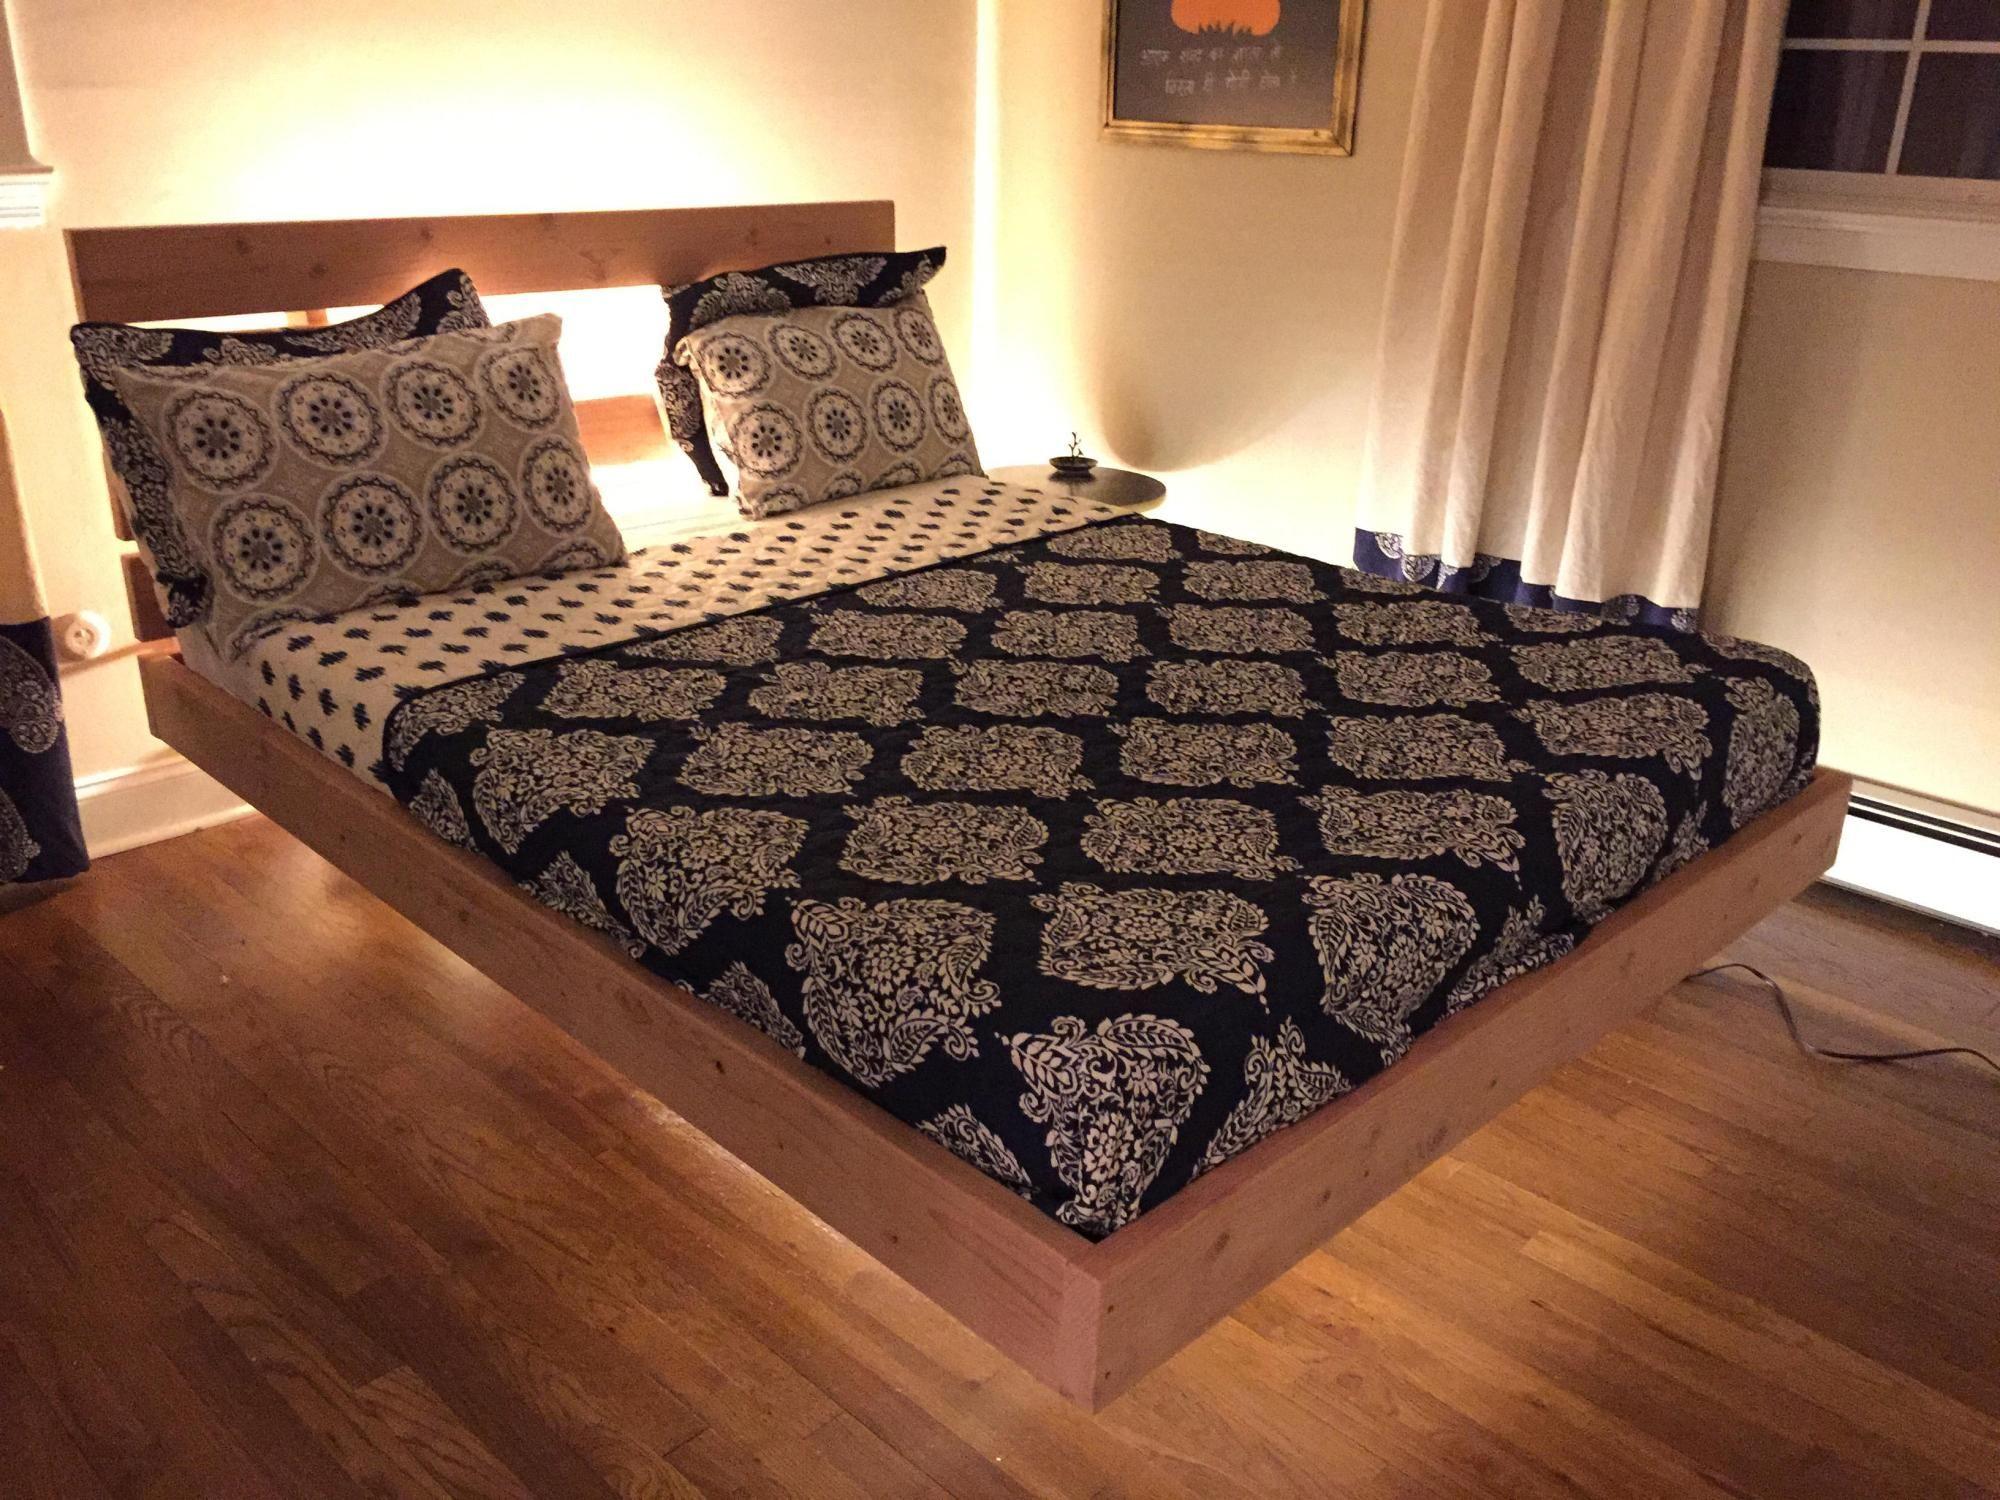 5 Free Floating Bed Frame Plans Sängram, Diy sängram